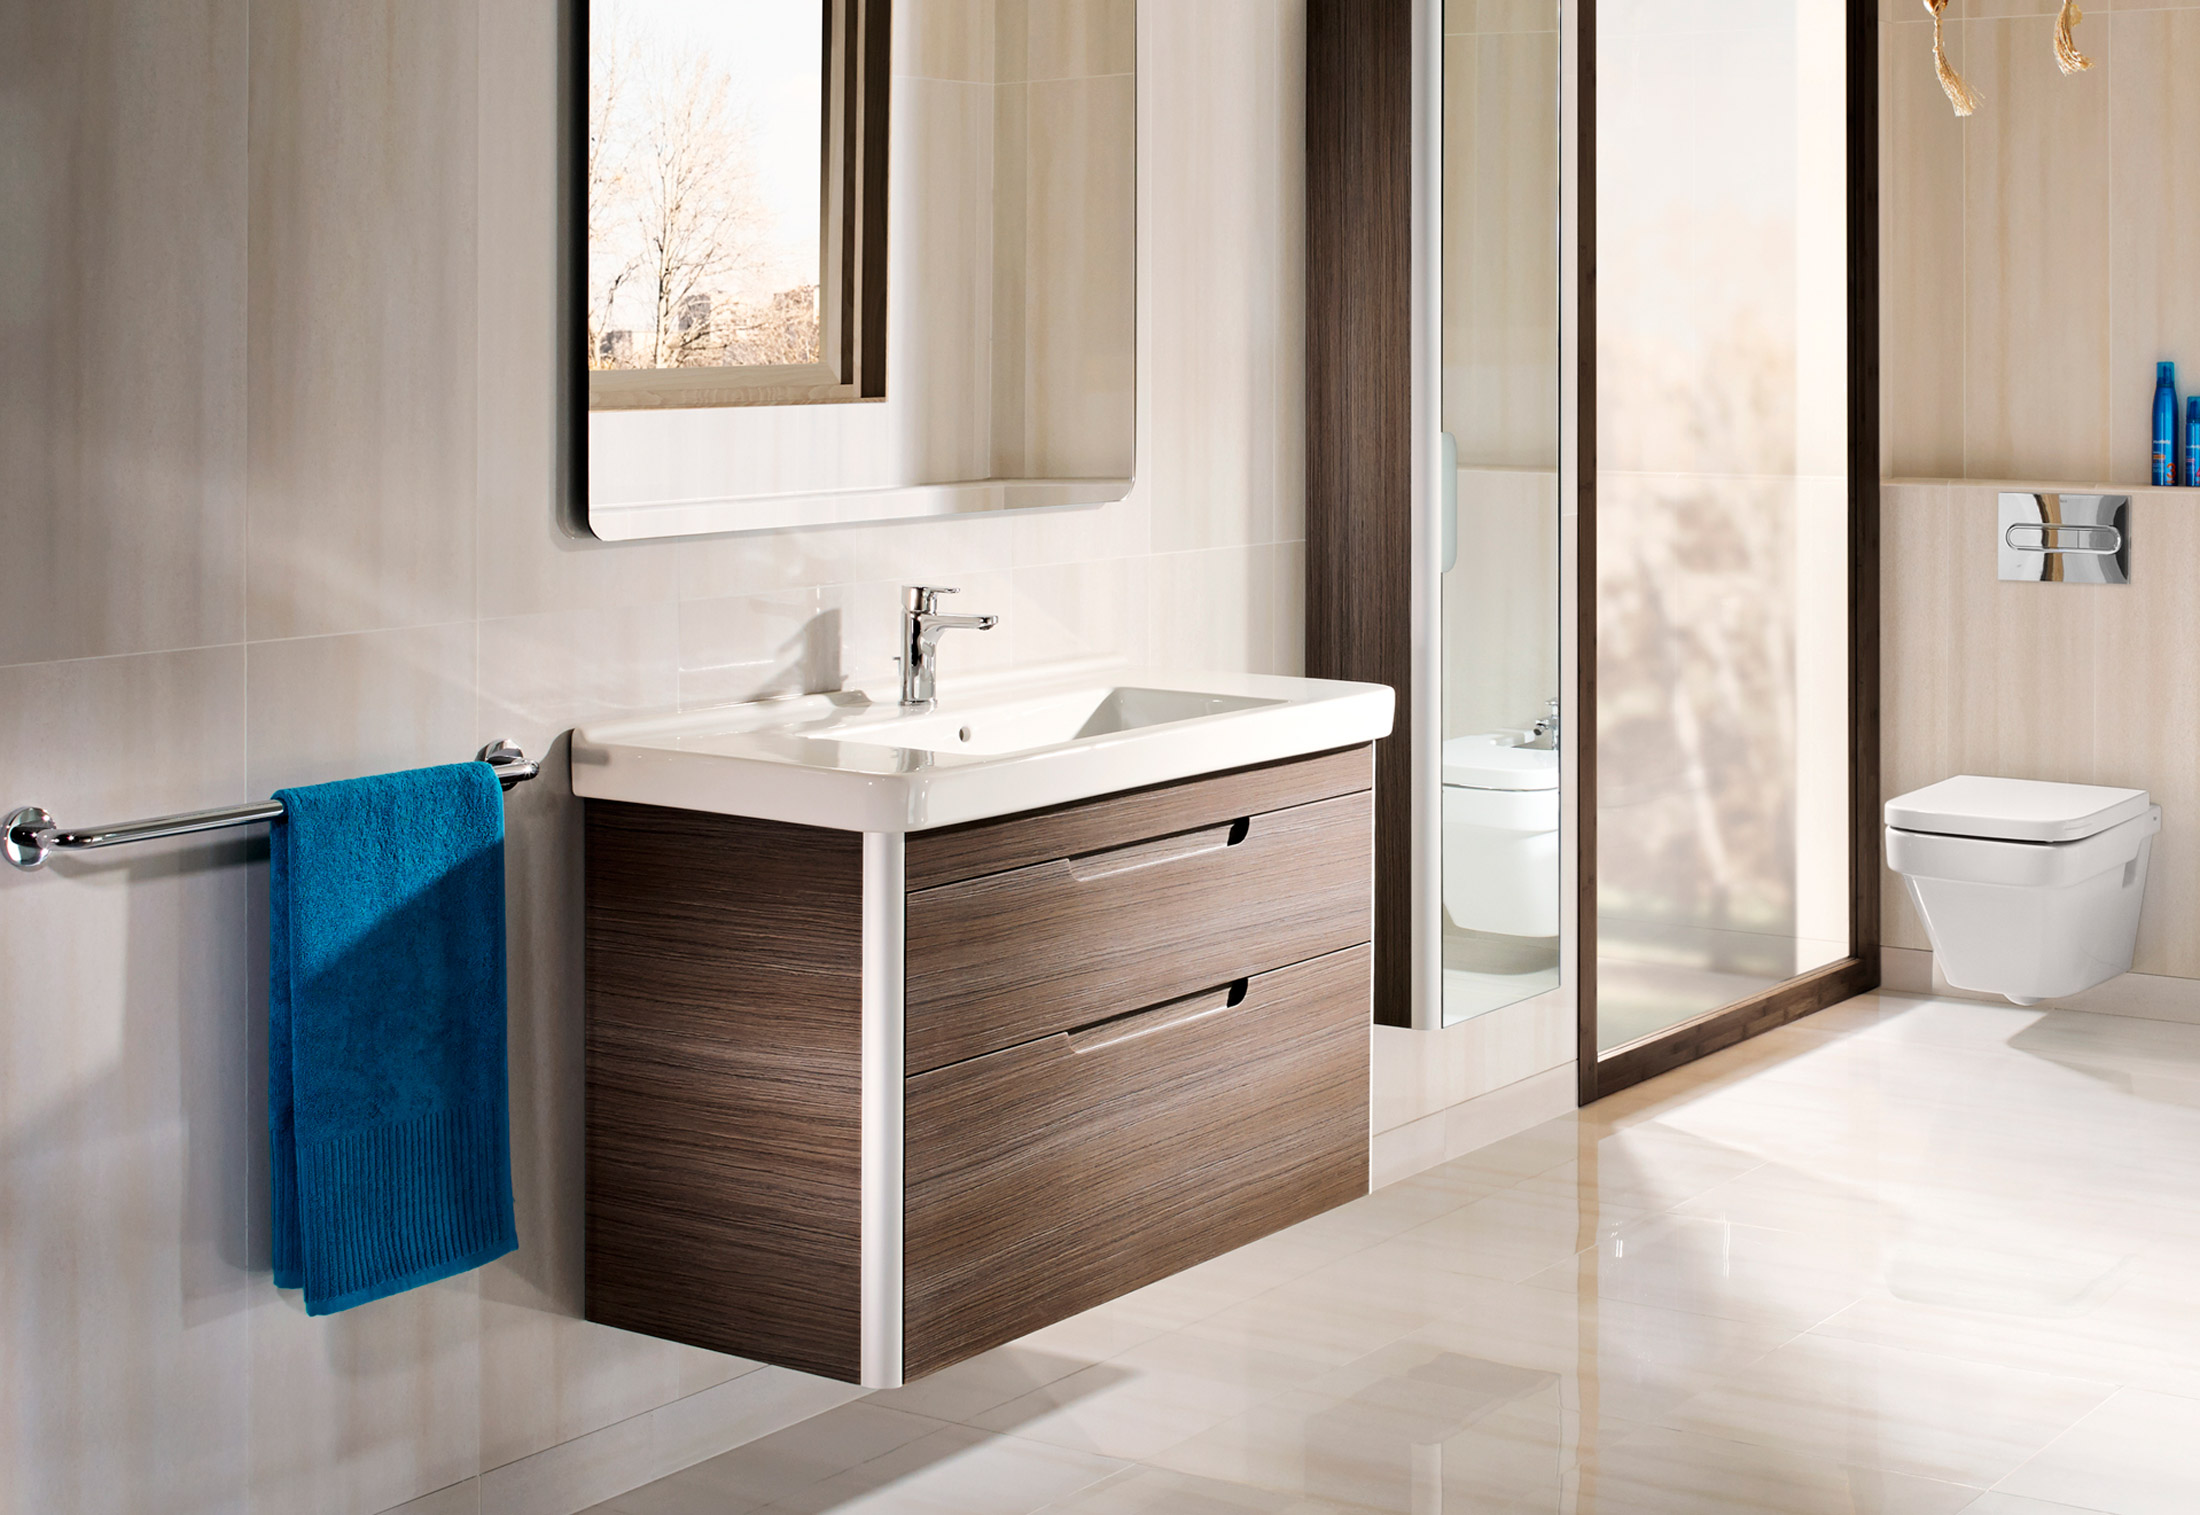 Dama wash basin with vanity unit by Roca | STYLEPARK